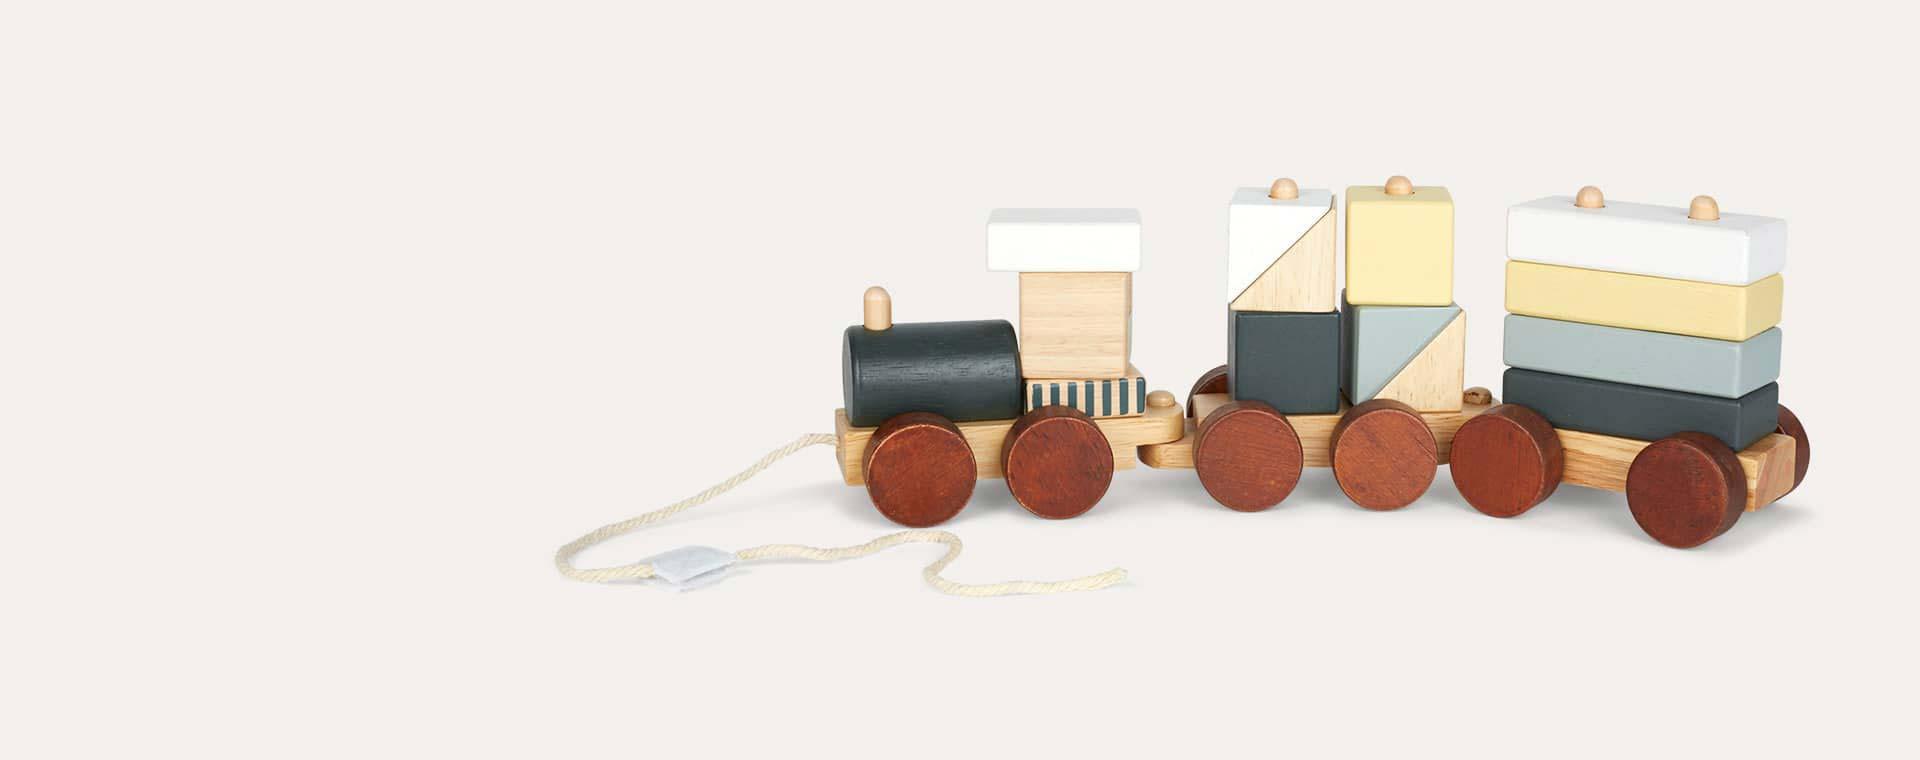 Neo Kid's Concept Neo Wooden Block Toy Train